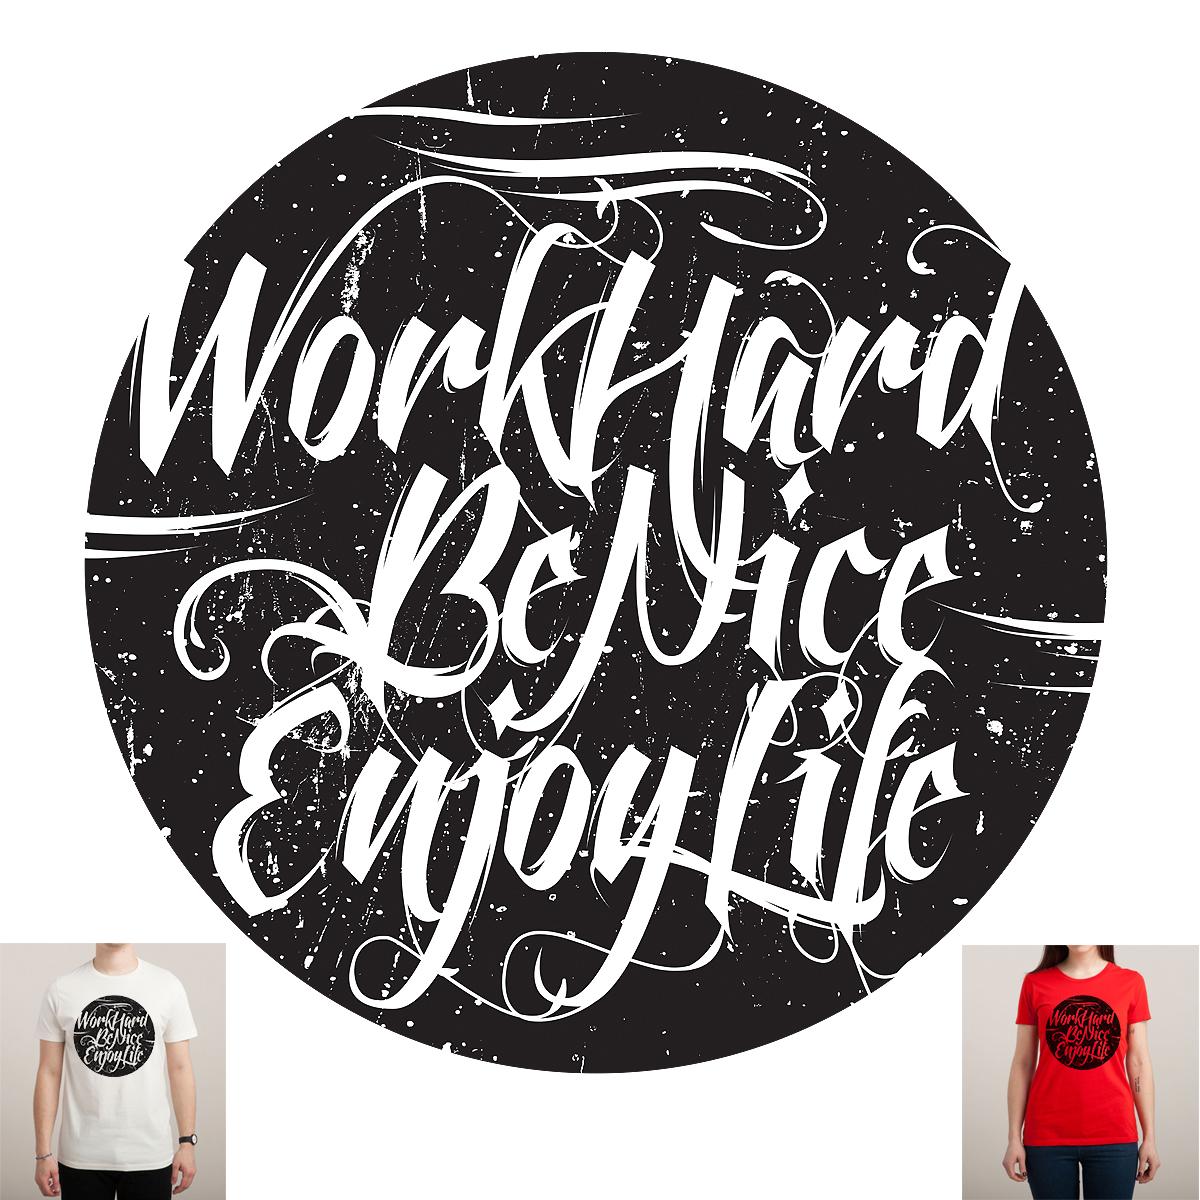 Work Hard Be Nice Enjoy Life by paulippines on Threadless